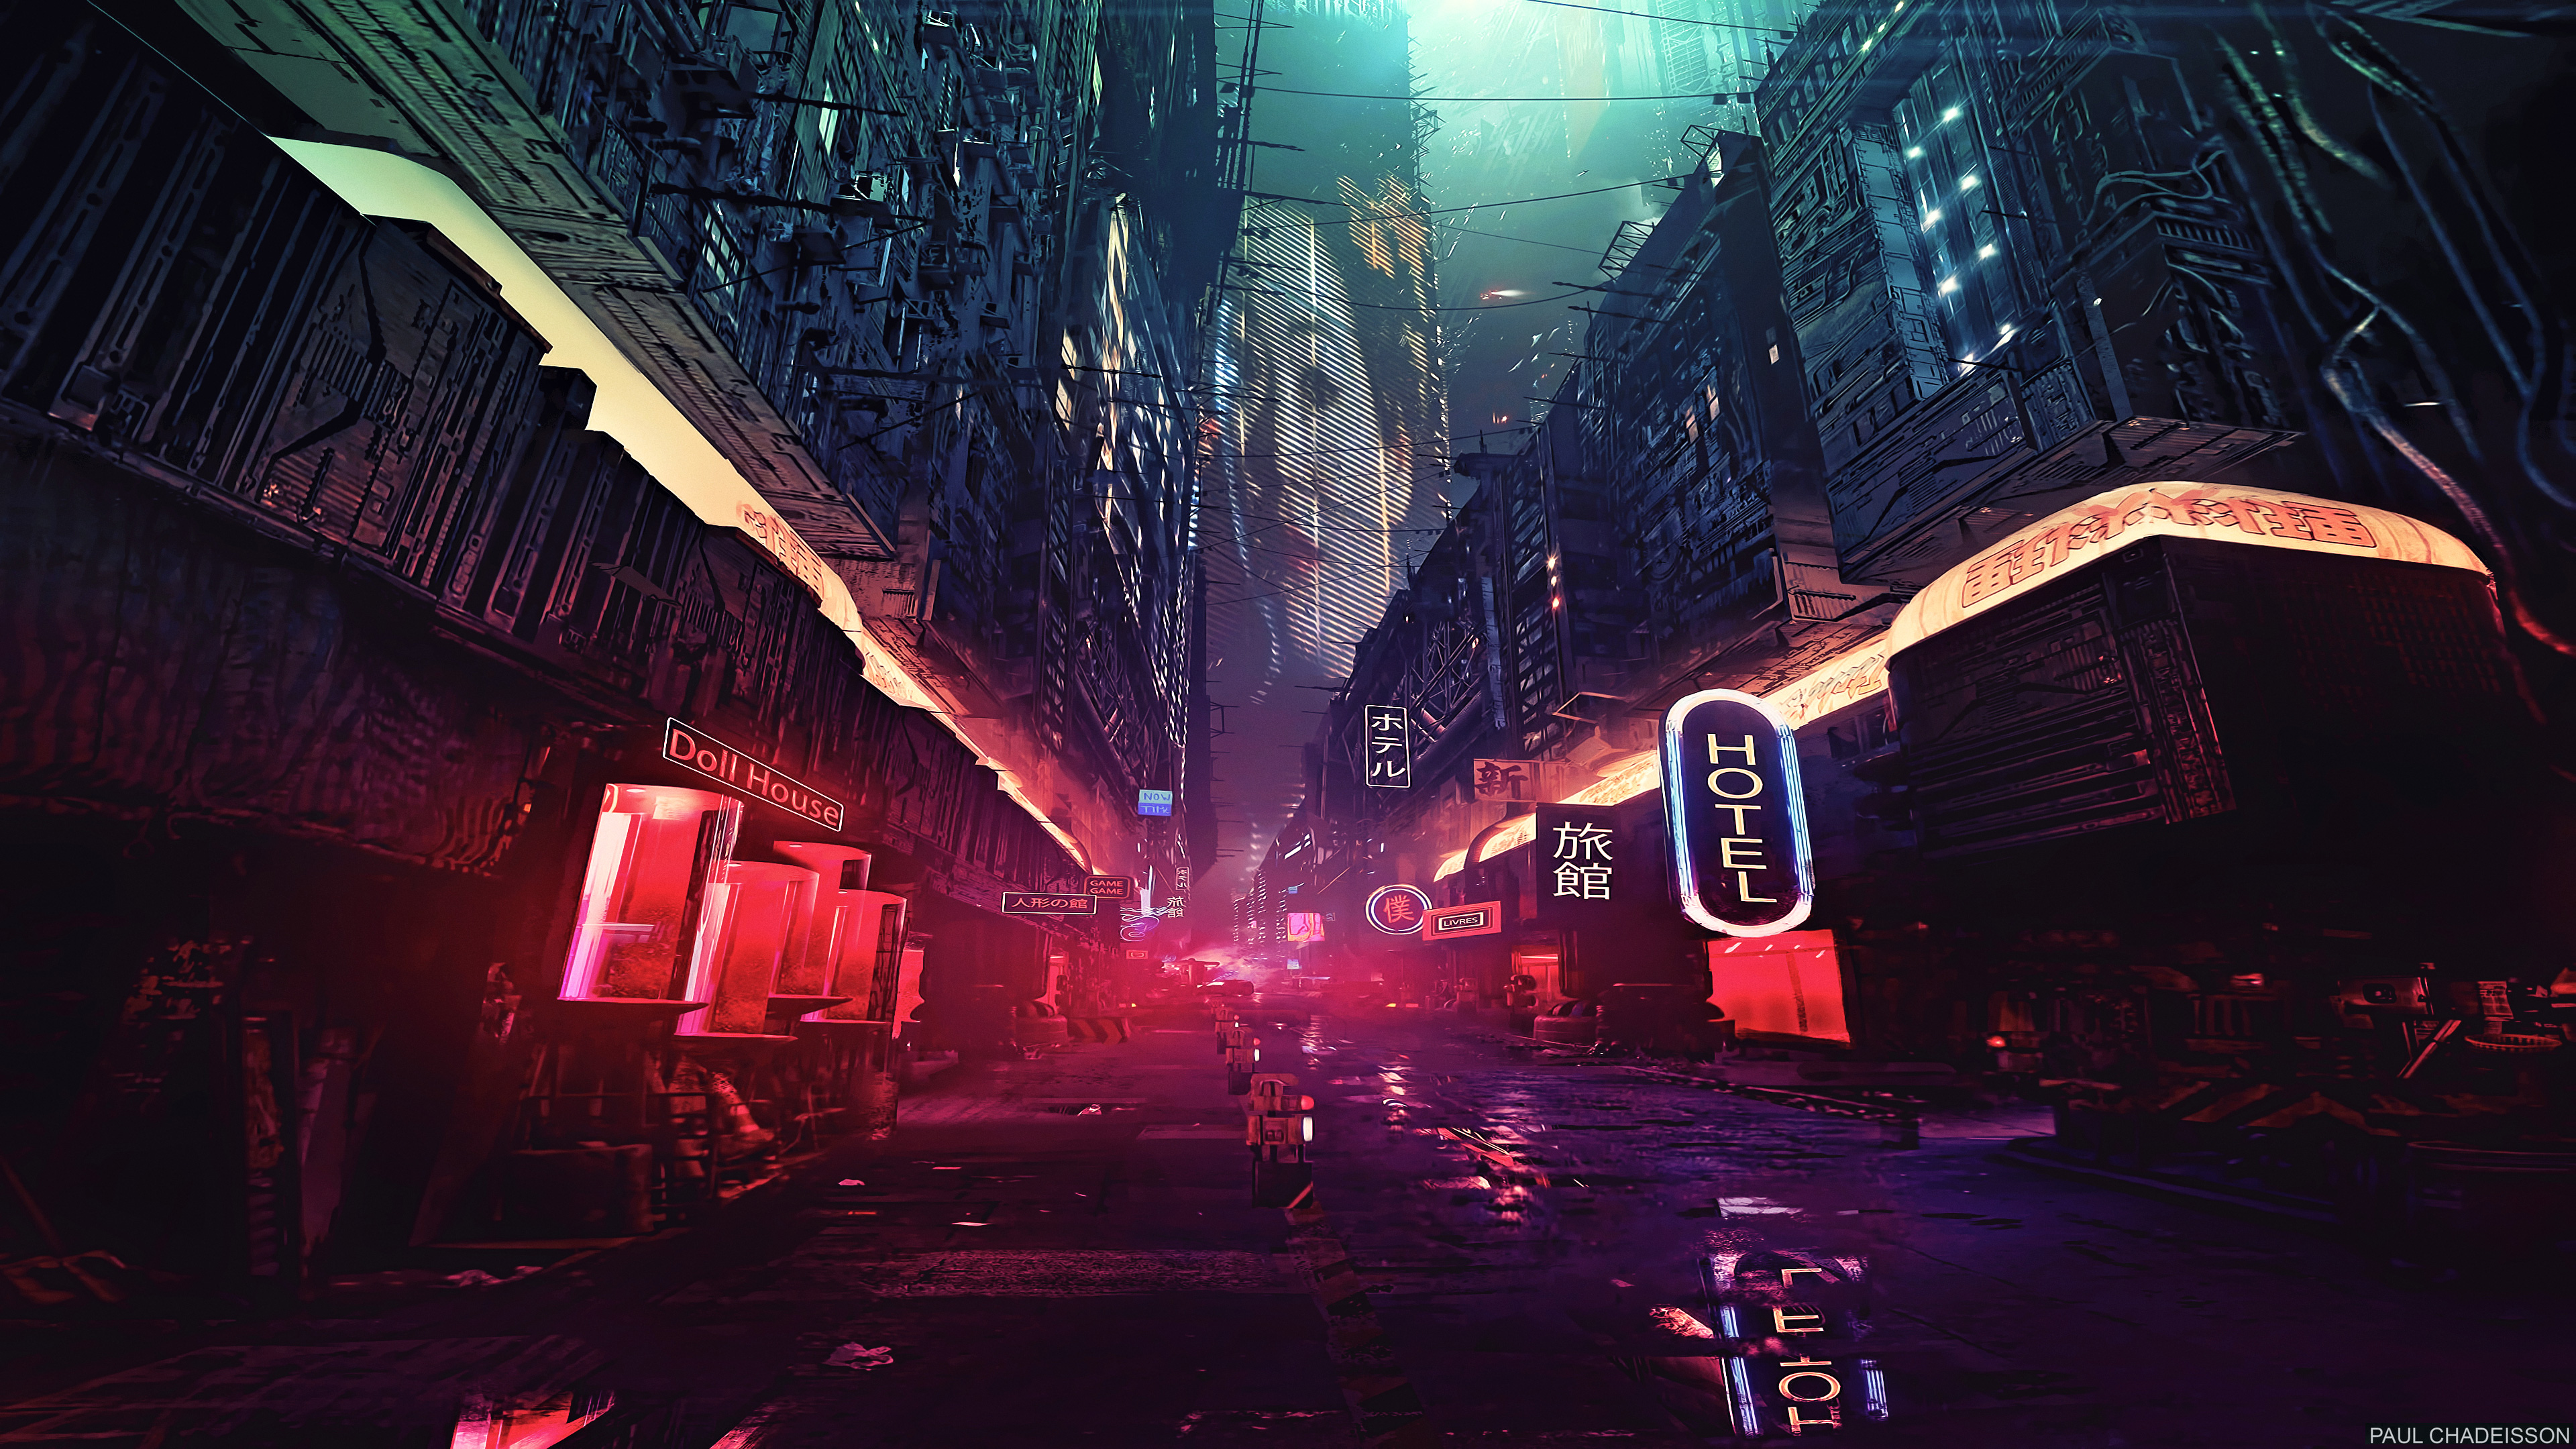 futuristic city science fiction concept art digital art 4k 1540752909 - Futuristic City Science Fiction Concept Art Digital Art 4k - hd-wallpapers, future wallpapers, digital art wallpapers, city wallpapers, artwork wallpapers, artstation wallpapers, artist wallpapers, 4k-wallpapers